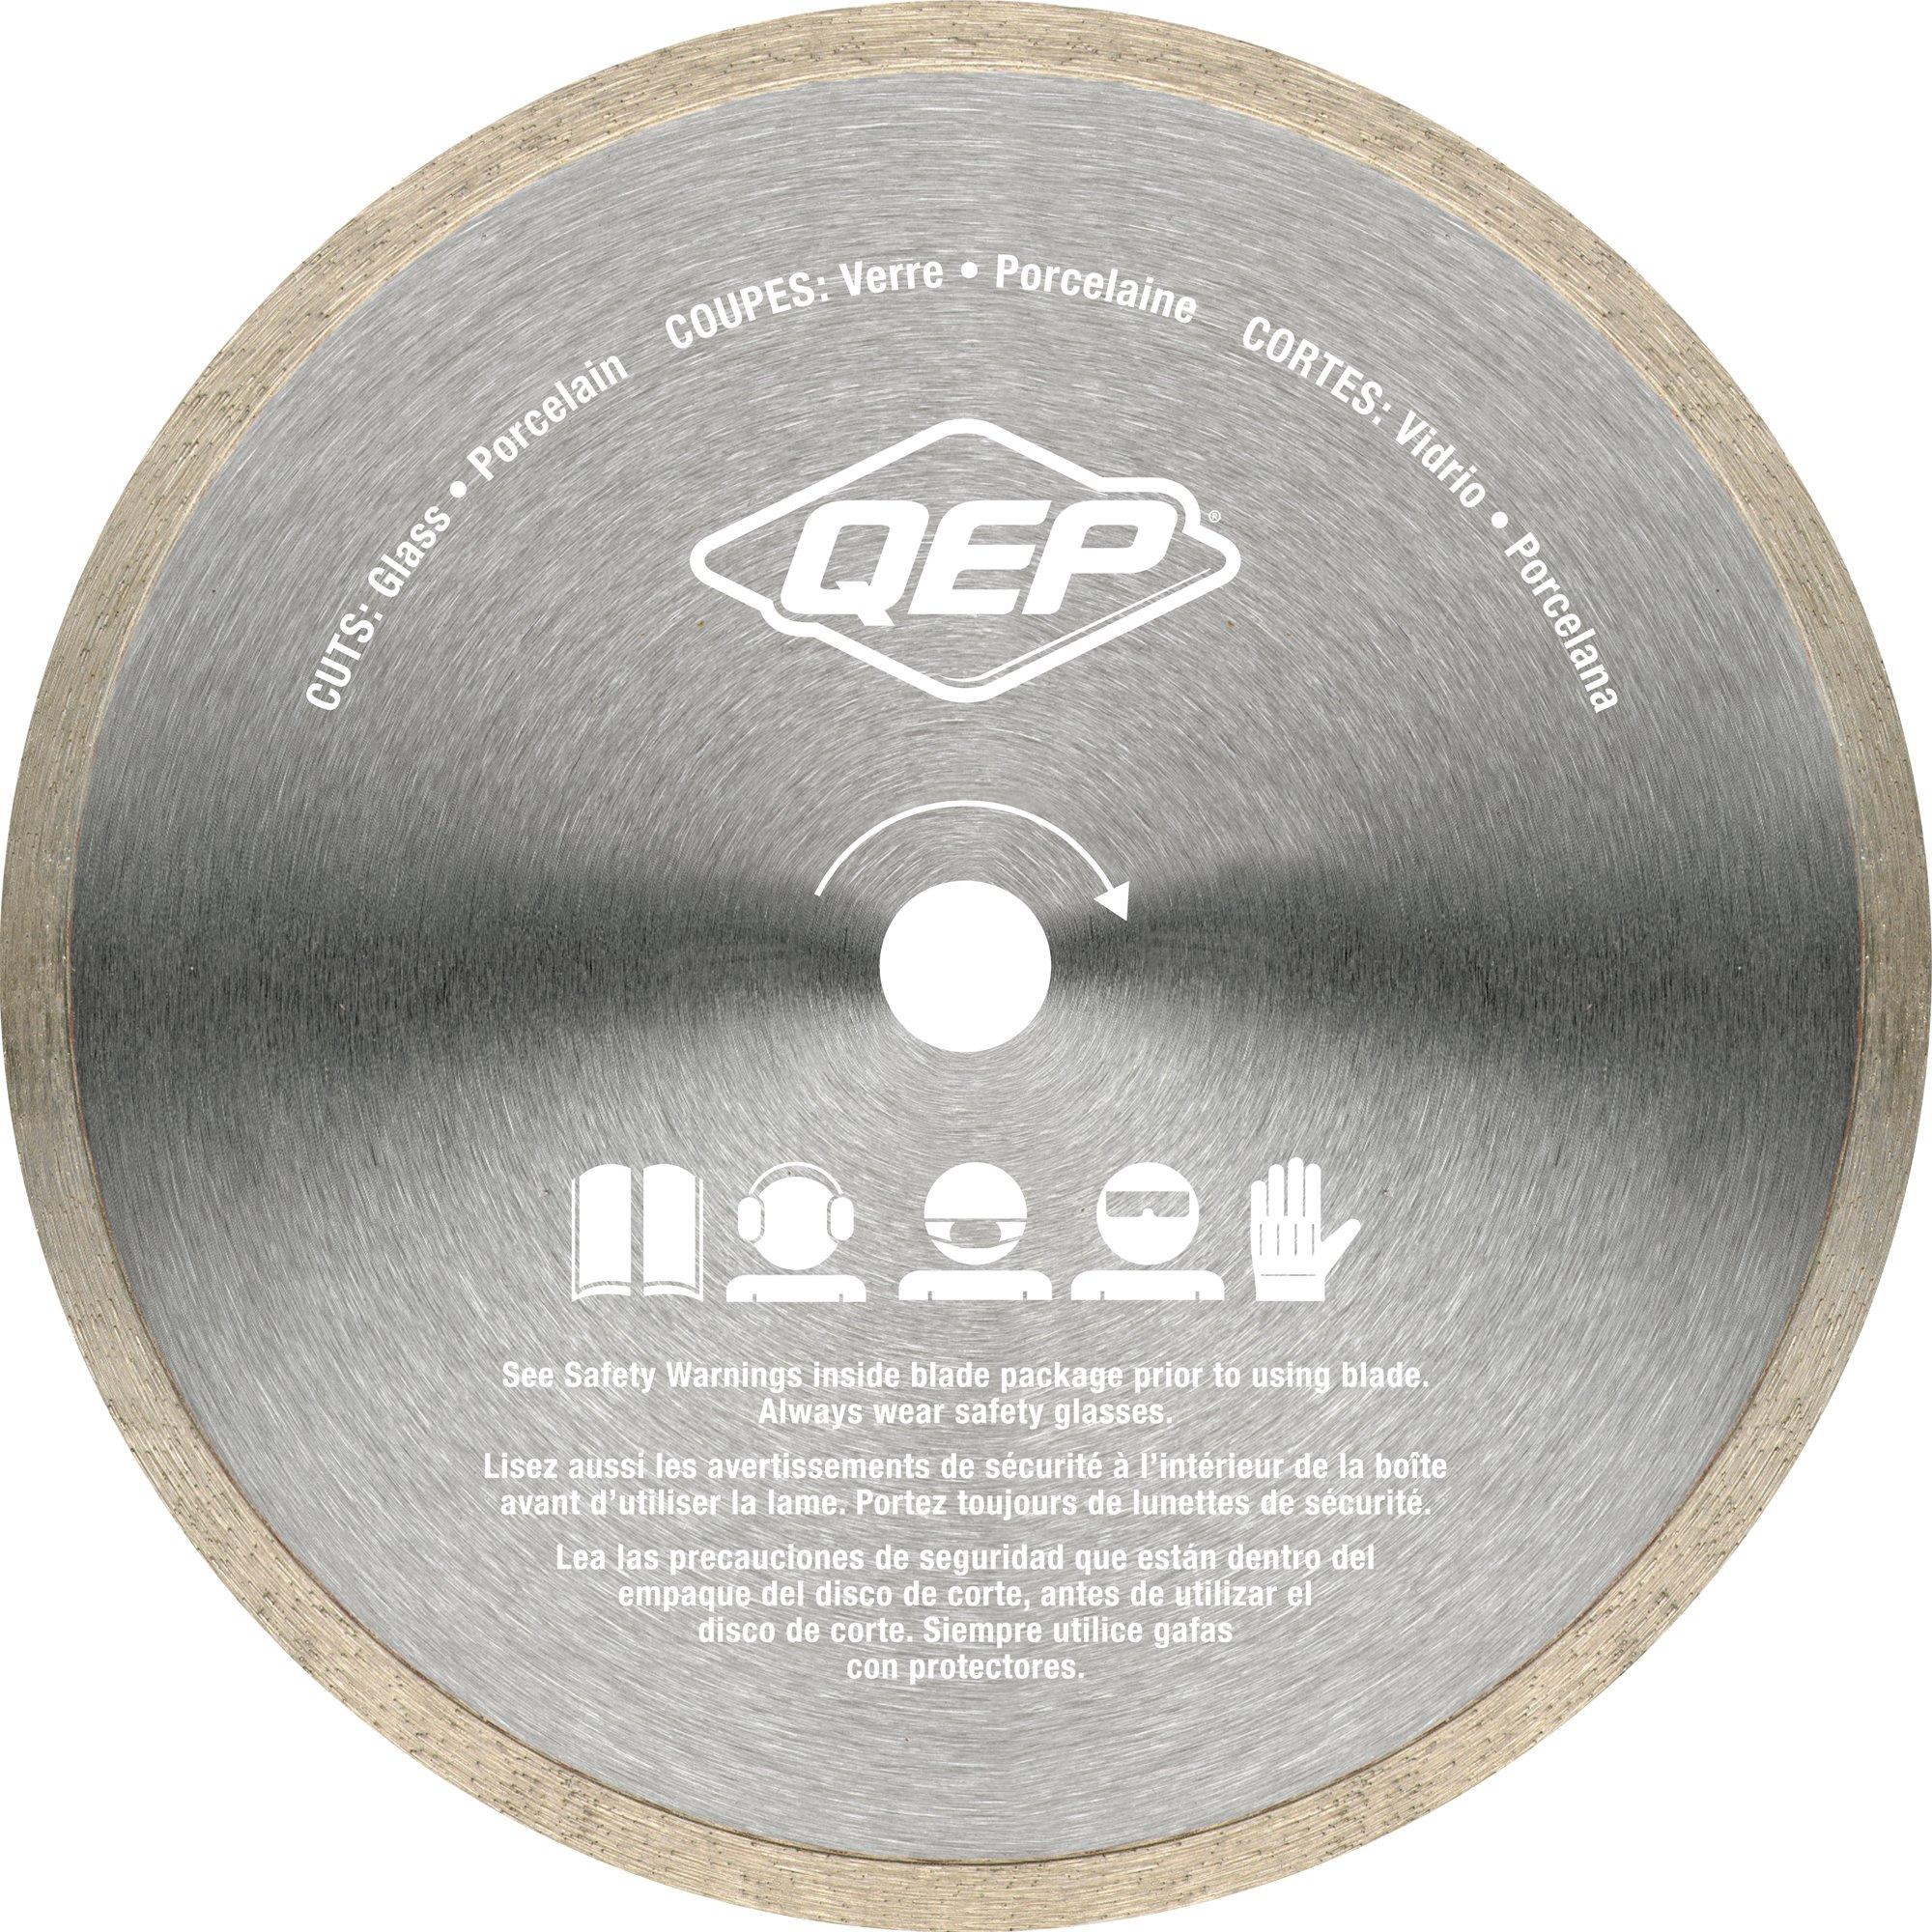 Qep 6 7006glq 7 Inch Continuous Rim Glass Tile Diamond